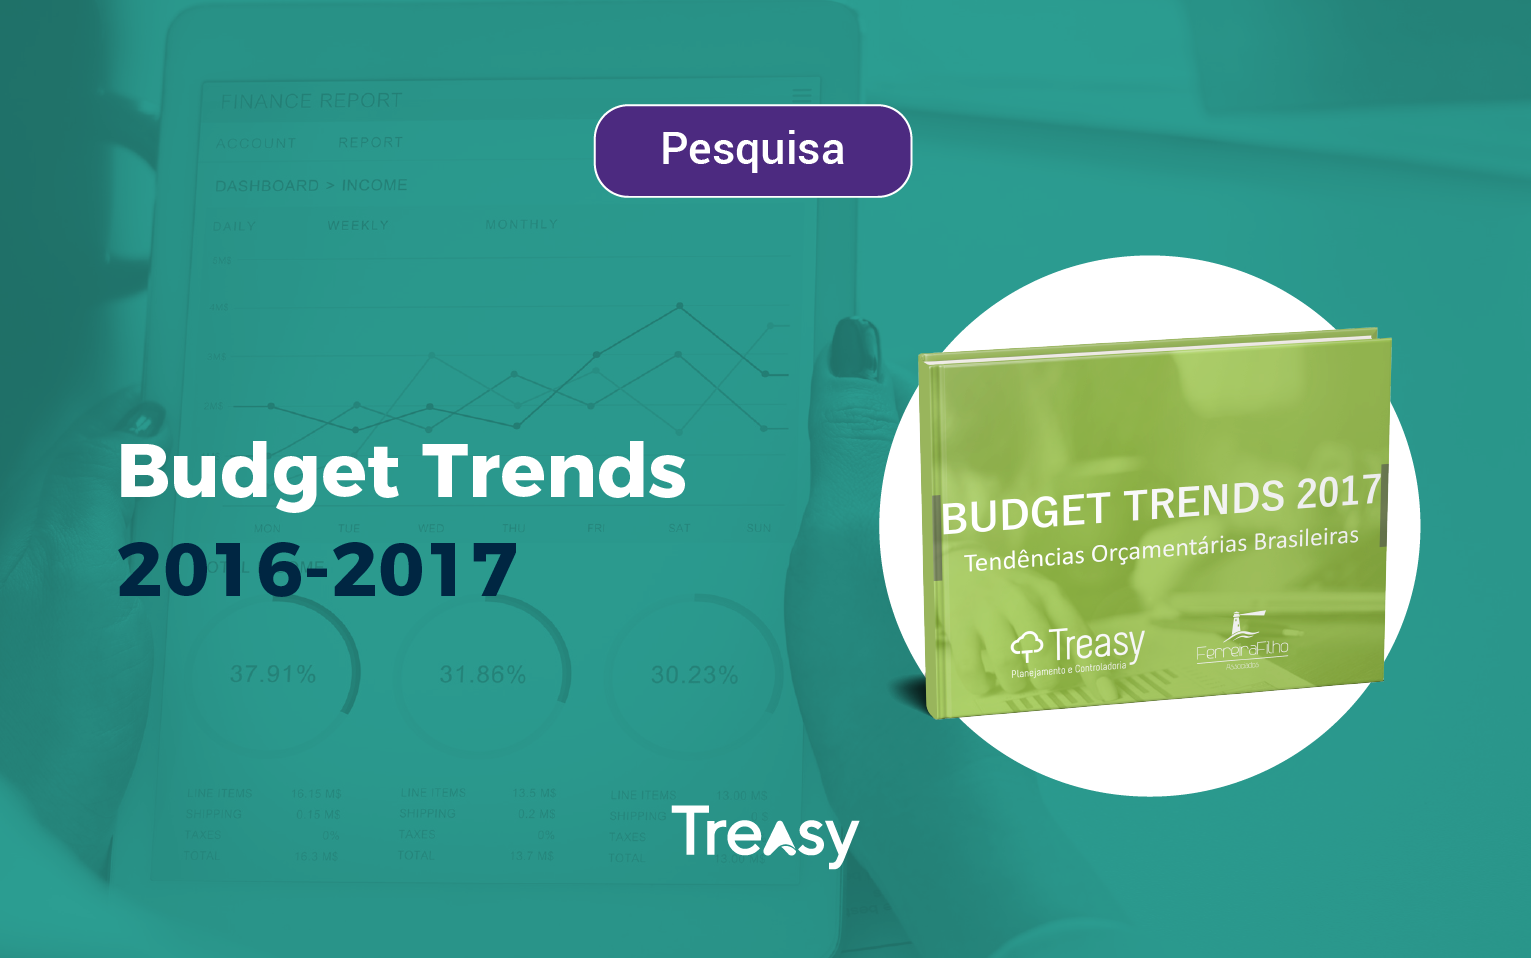 Pesquisa Budget Trends 2016 - 2017